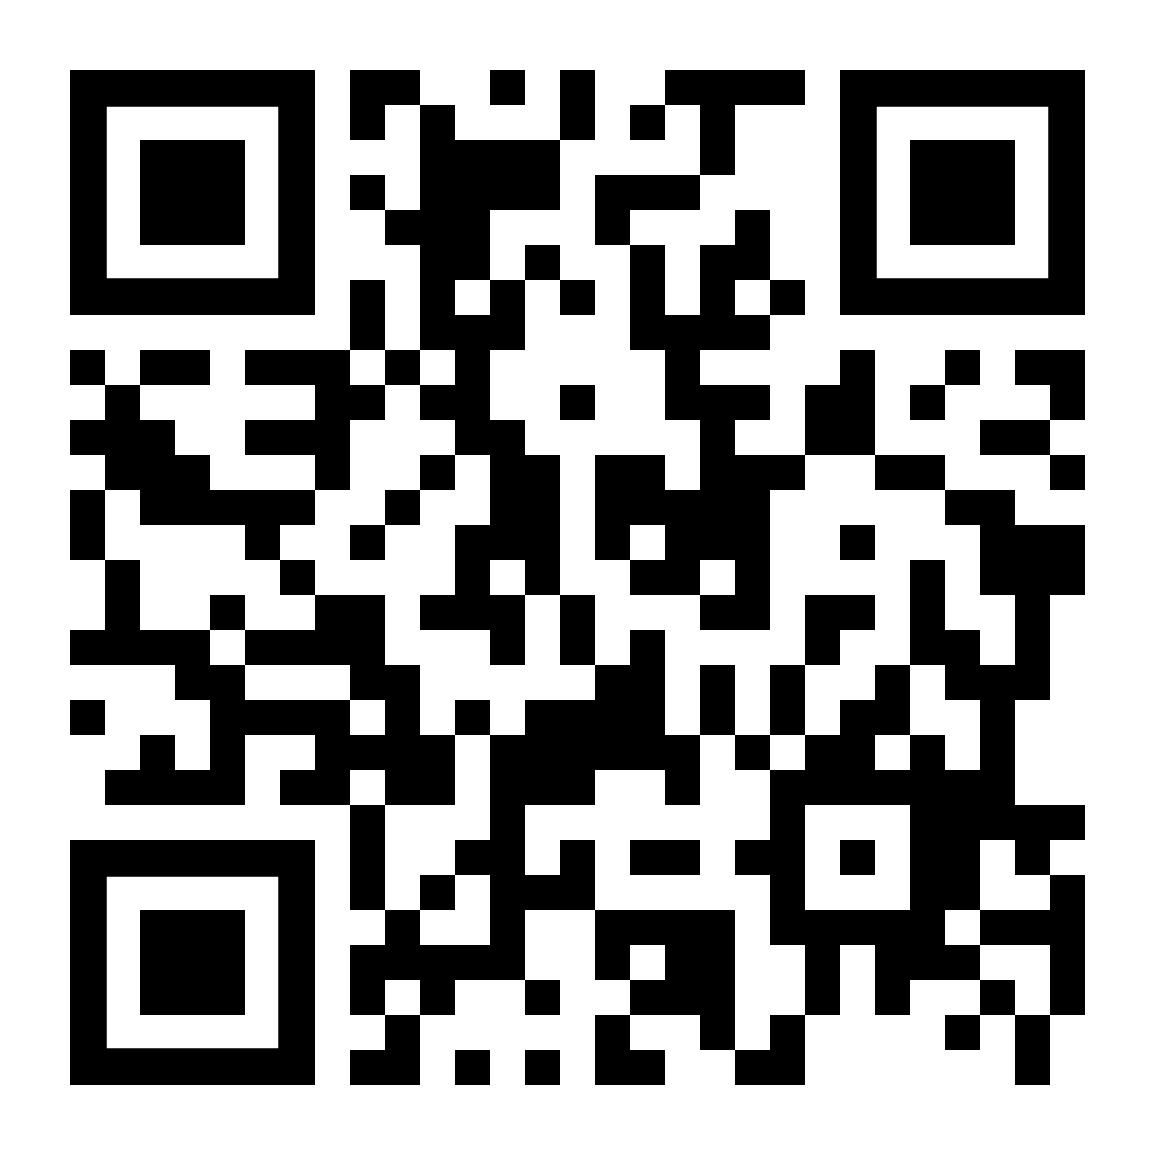 2020_Seneca_Park_Sunday_Funday_QR_Code